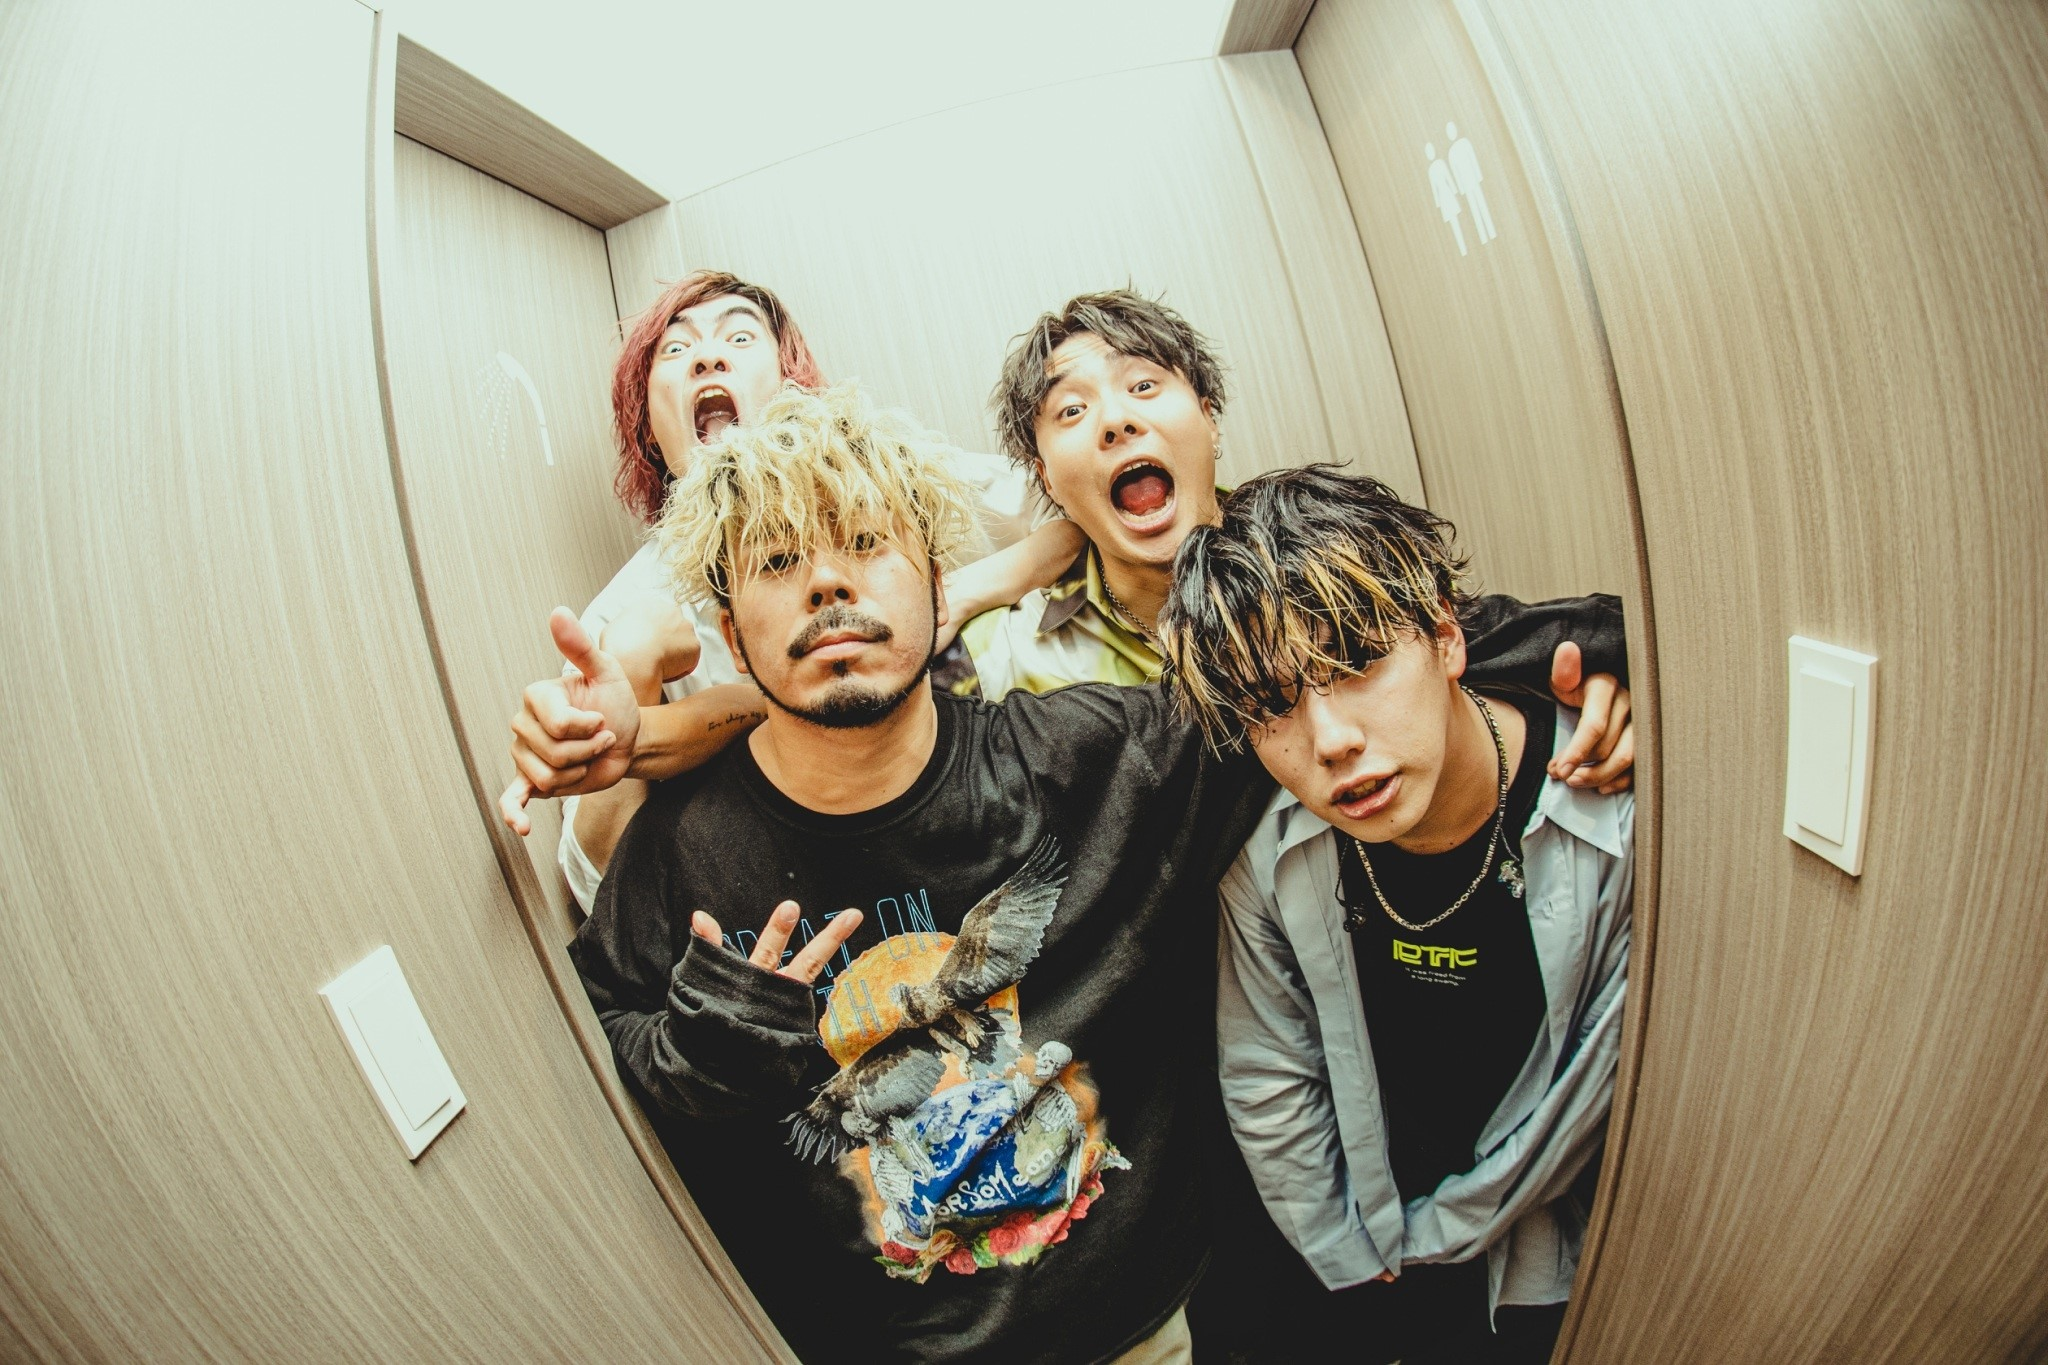 【MFS PRIME】TOUR 2021 continuation of the story(Zepp Haneda) MFS PRIME限定公開スタート!